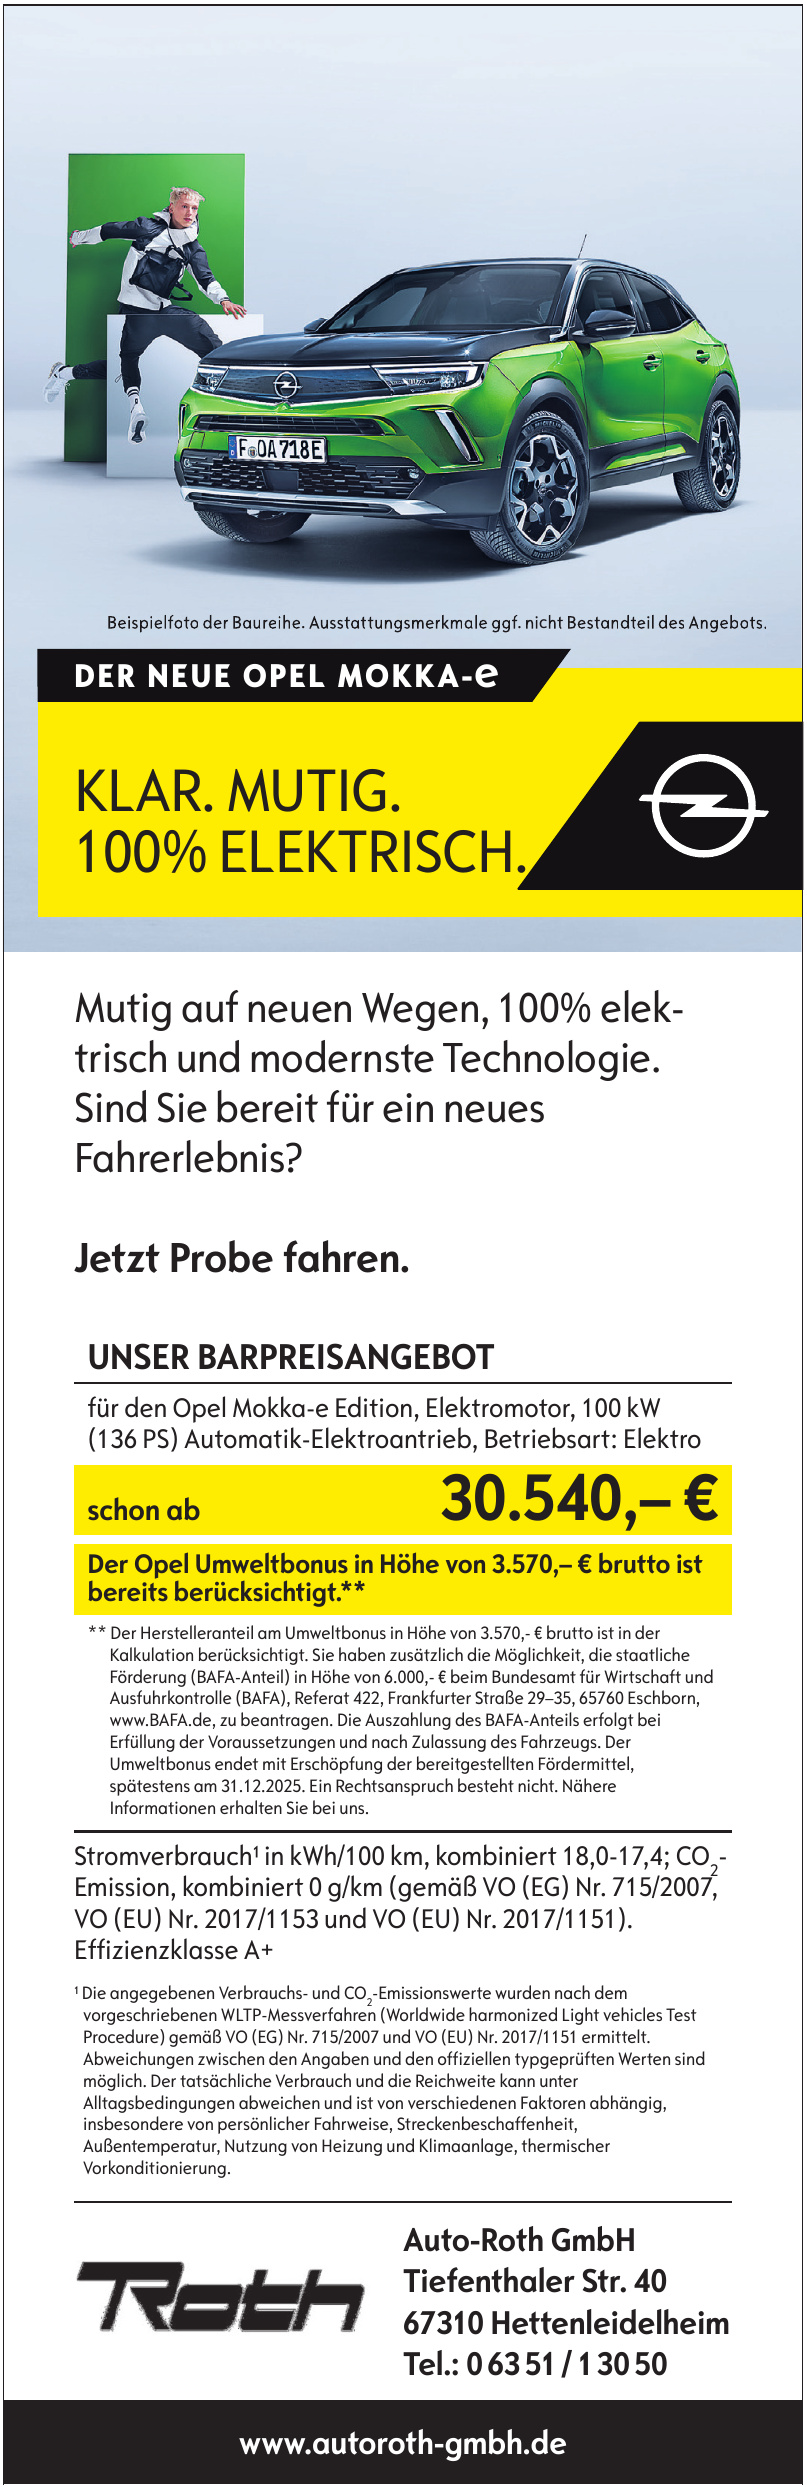 Auto-Roth GmbH